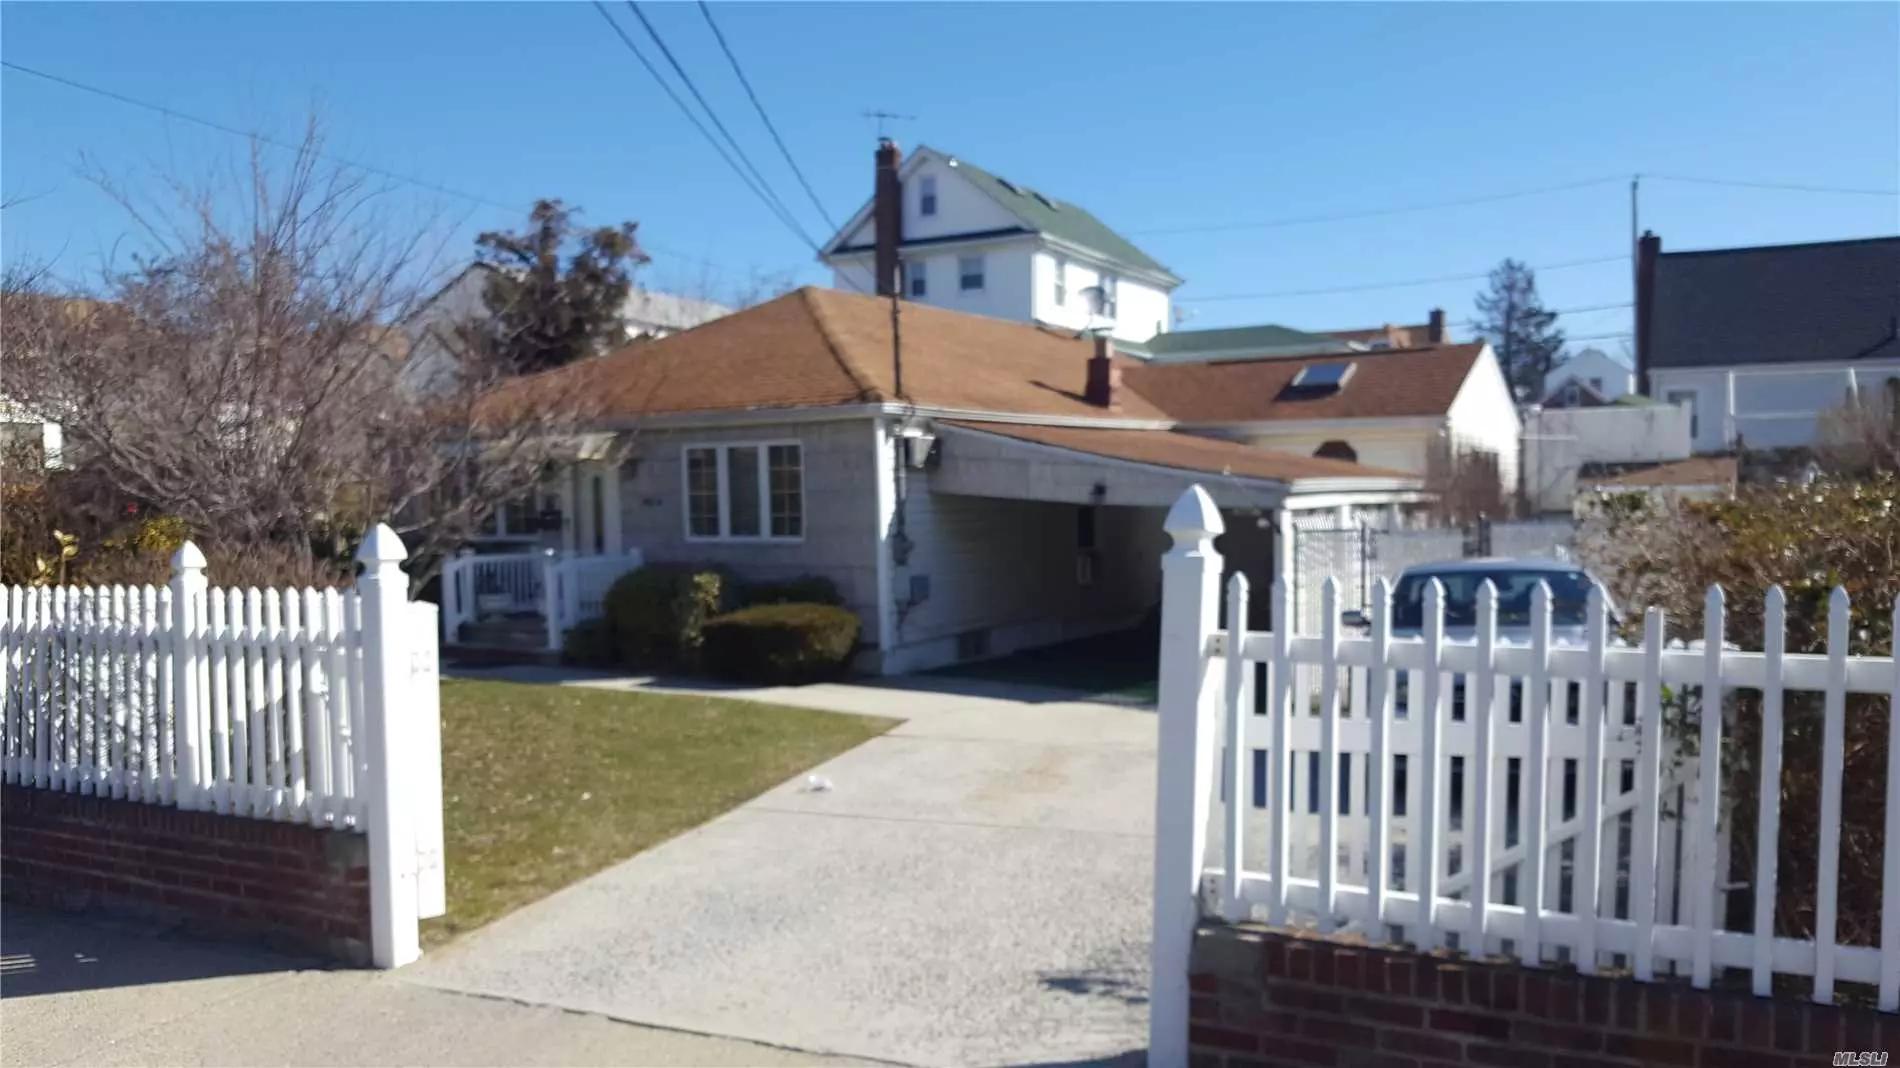 Mint Exp. Ranch, Fdr, Eik, Wood Floors, Den, 3 B/Rms, 2 Skylites, Side Patio On 65 X 80 Property.